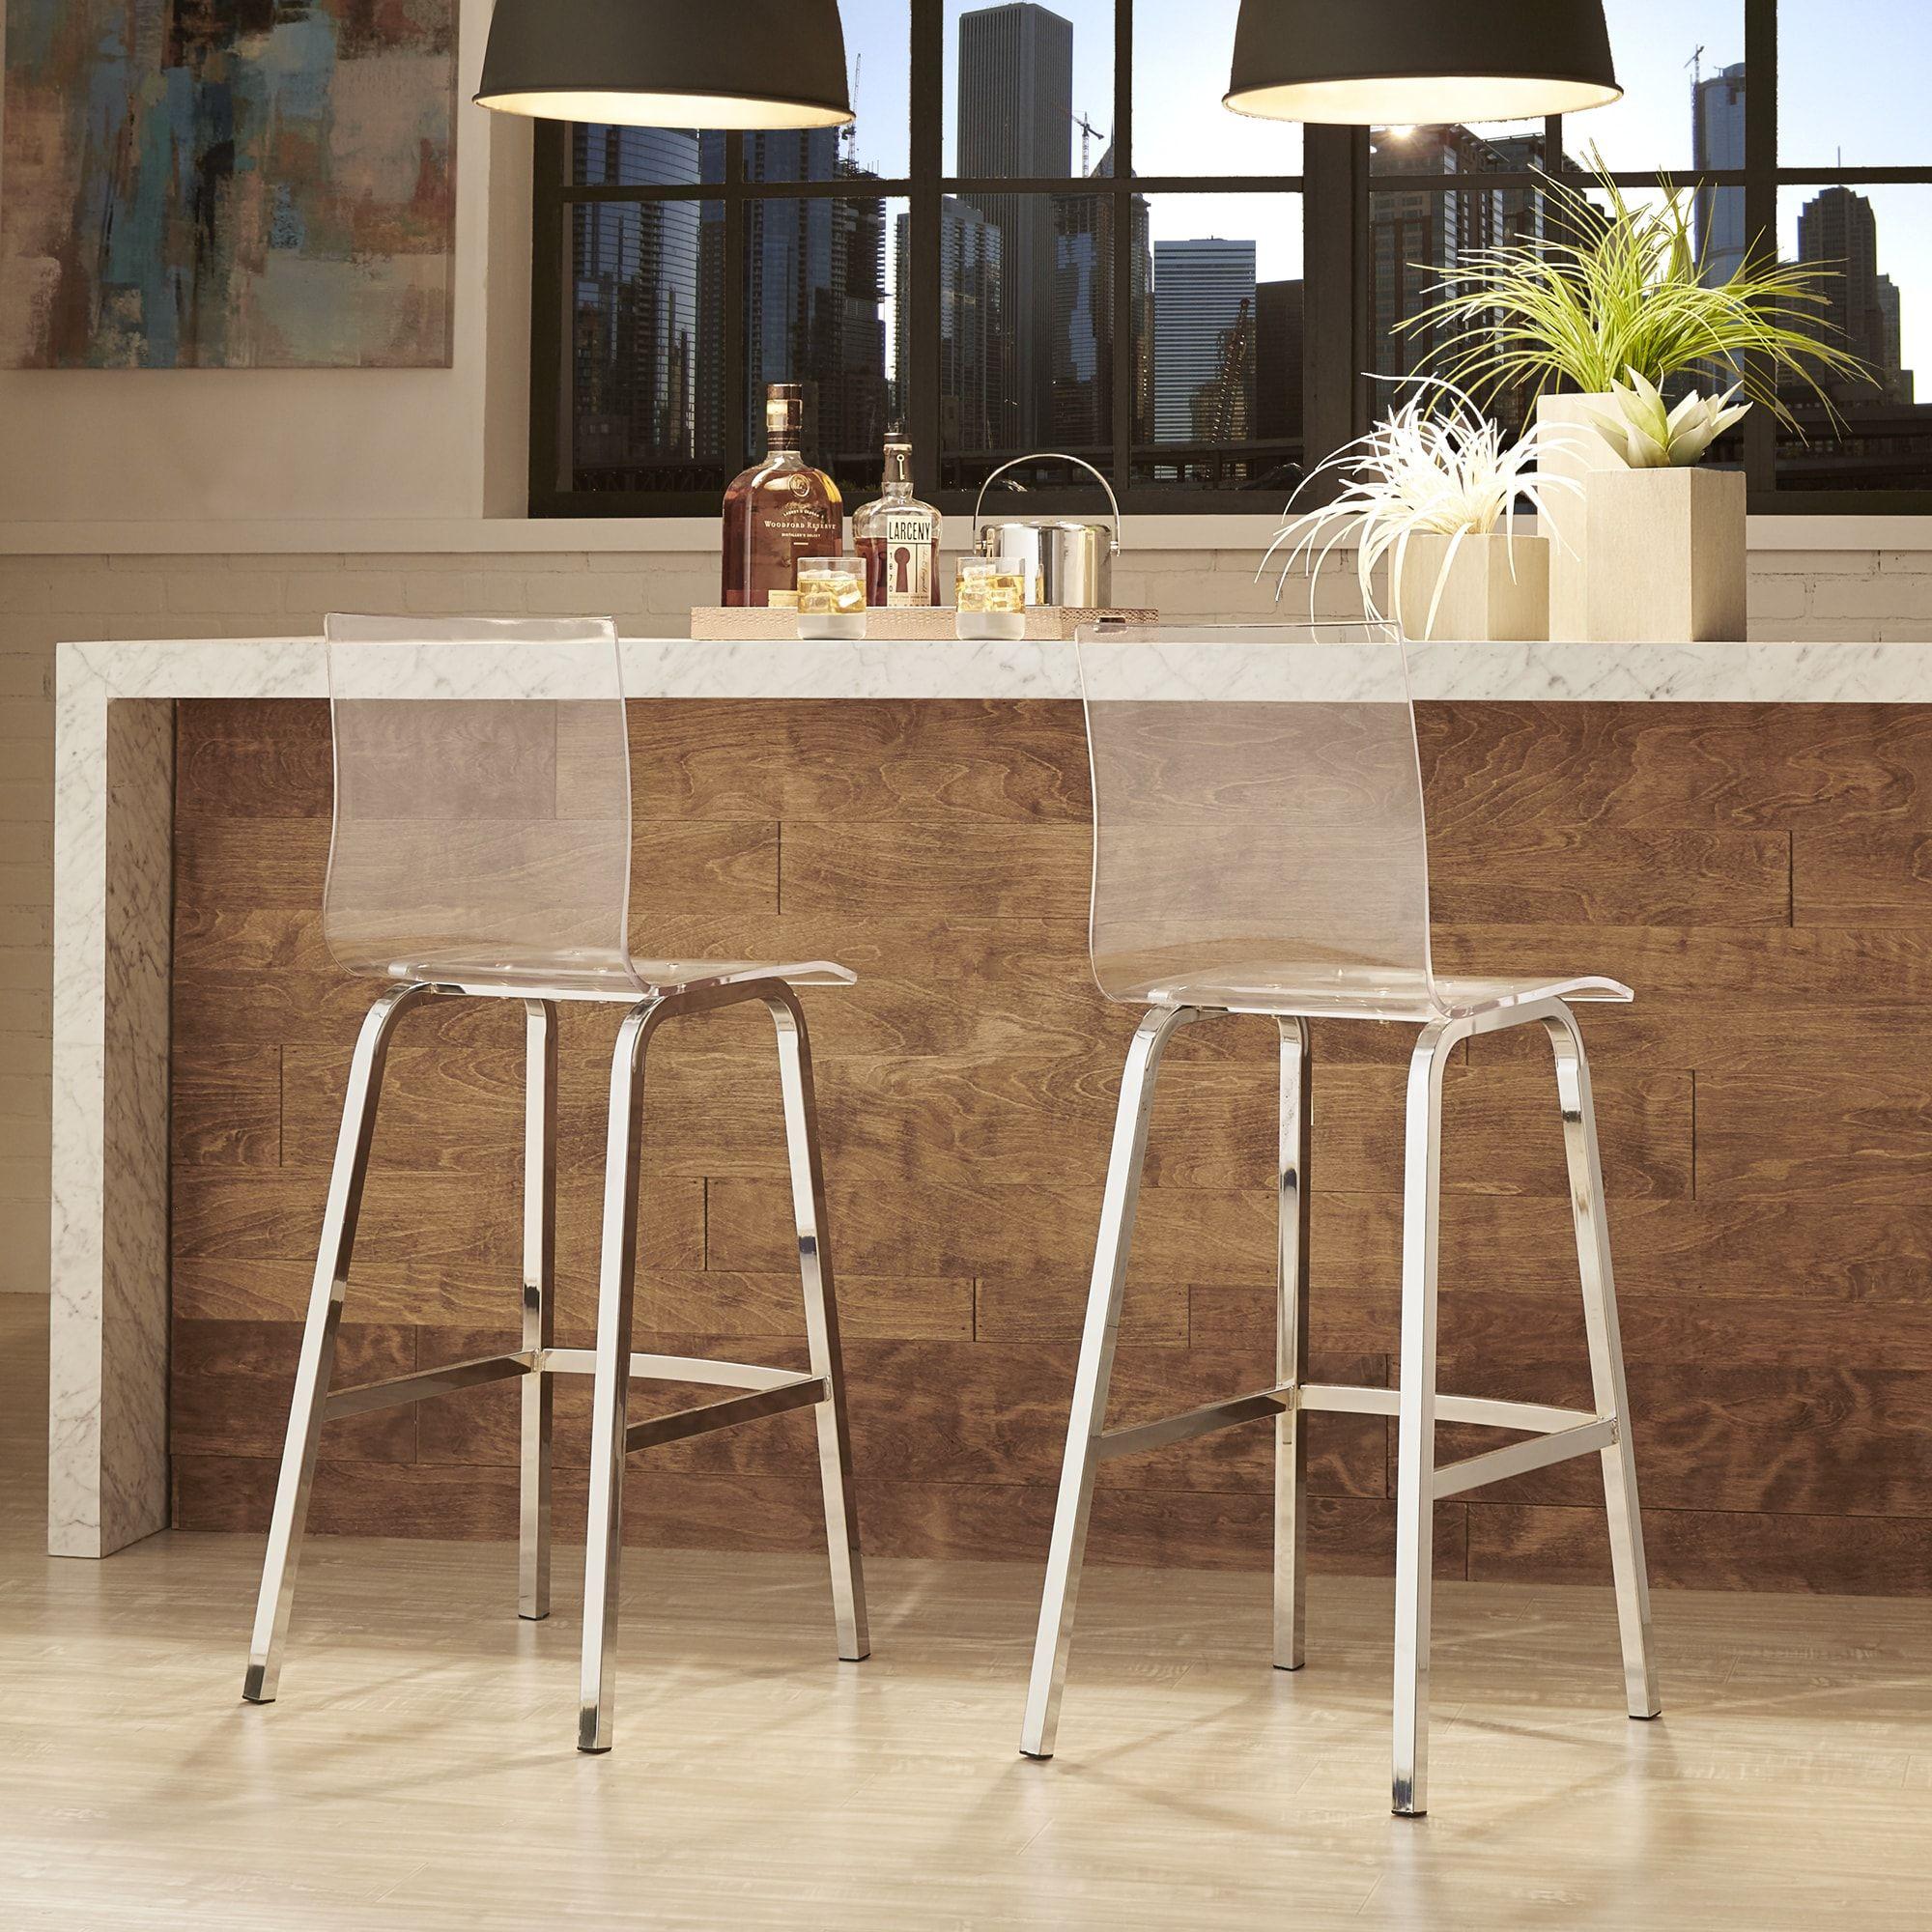 stool counter acrylic stools pc spirit